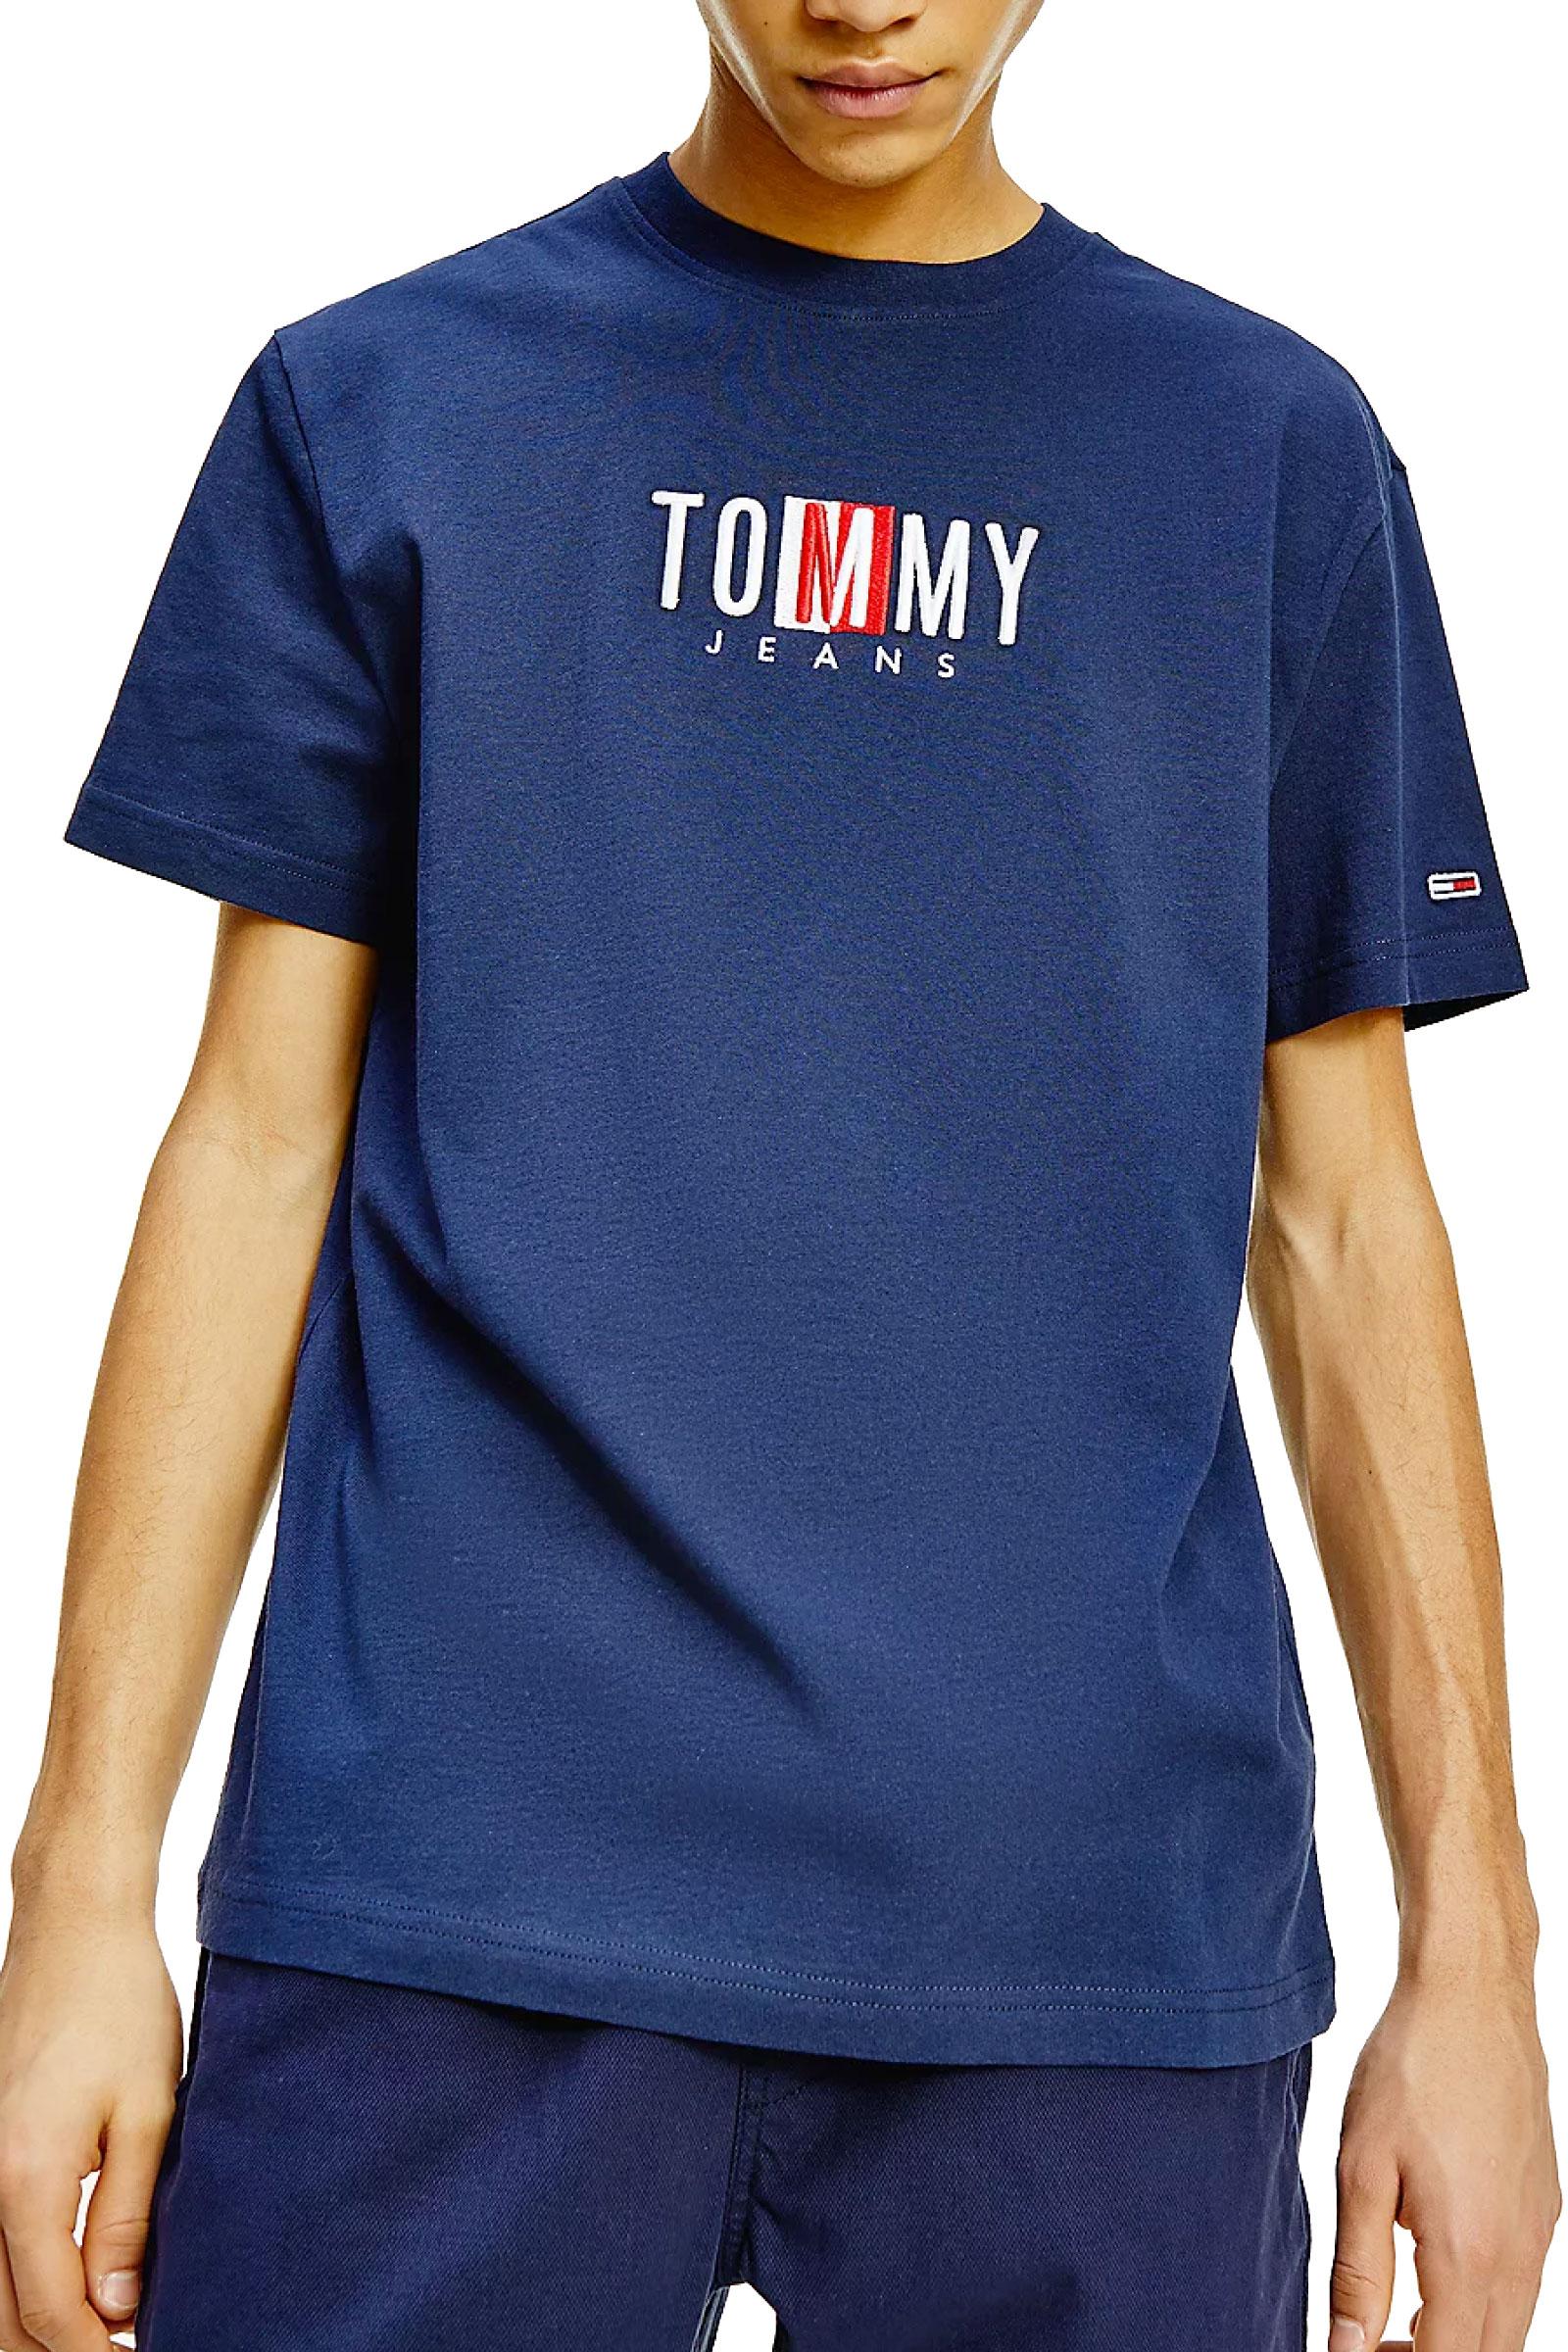 TOMMY JEANS T-Shirt Uomo TOMMY JEANS | T-Shirt | DM0DM10218C87